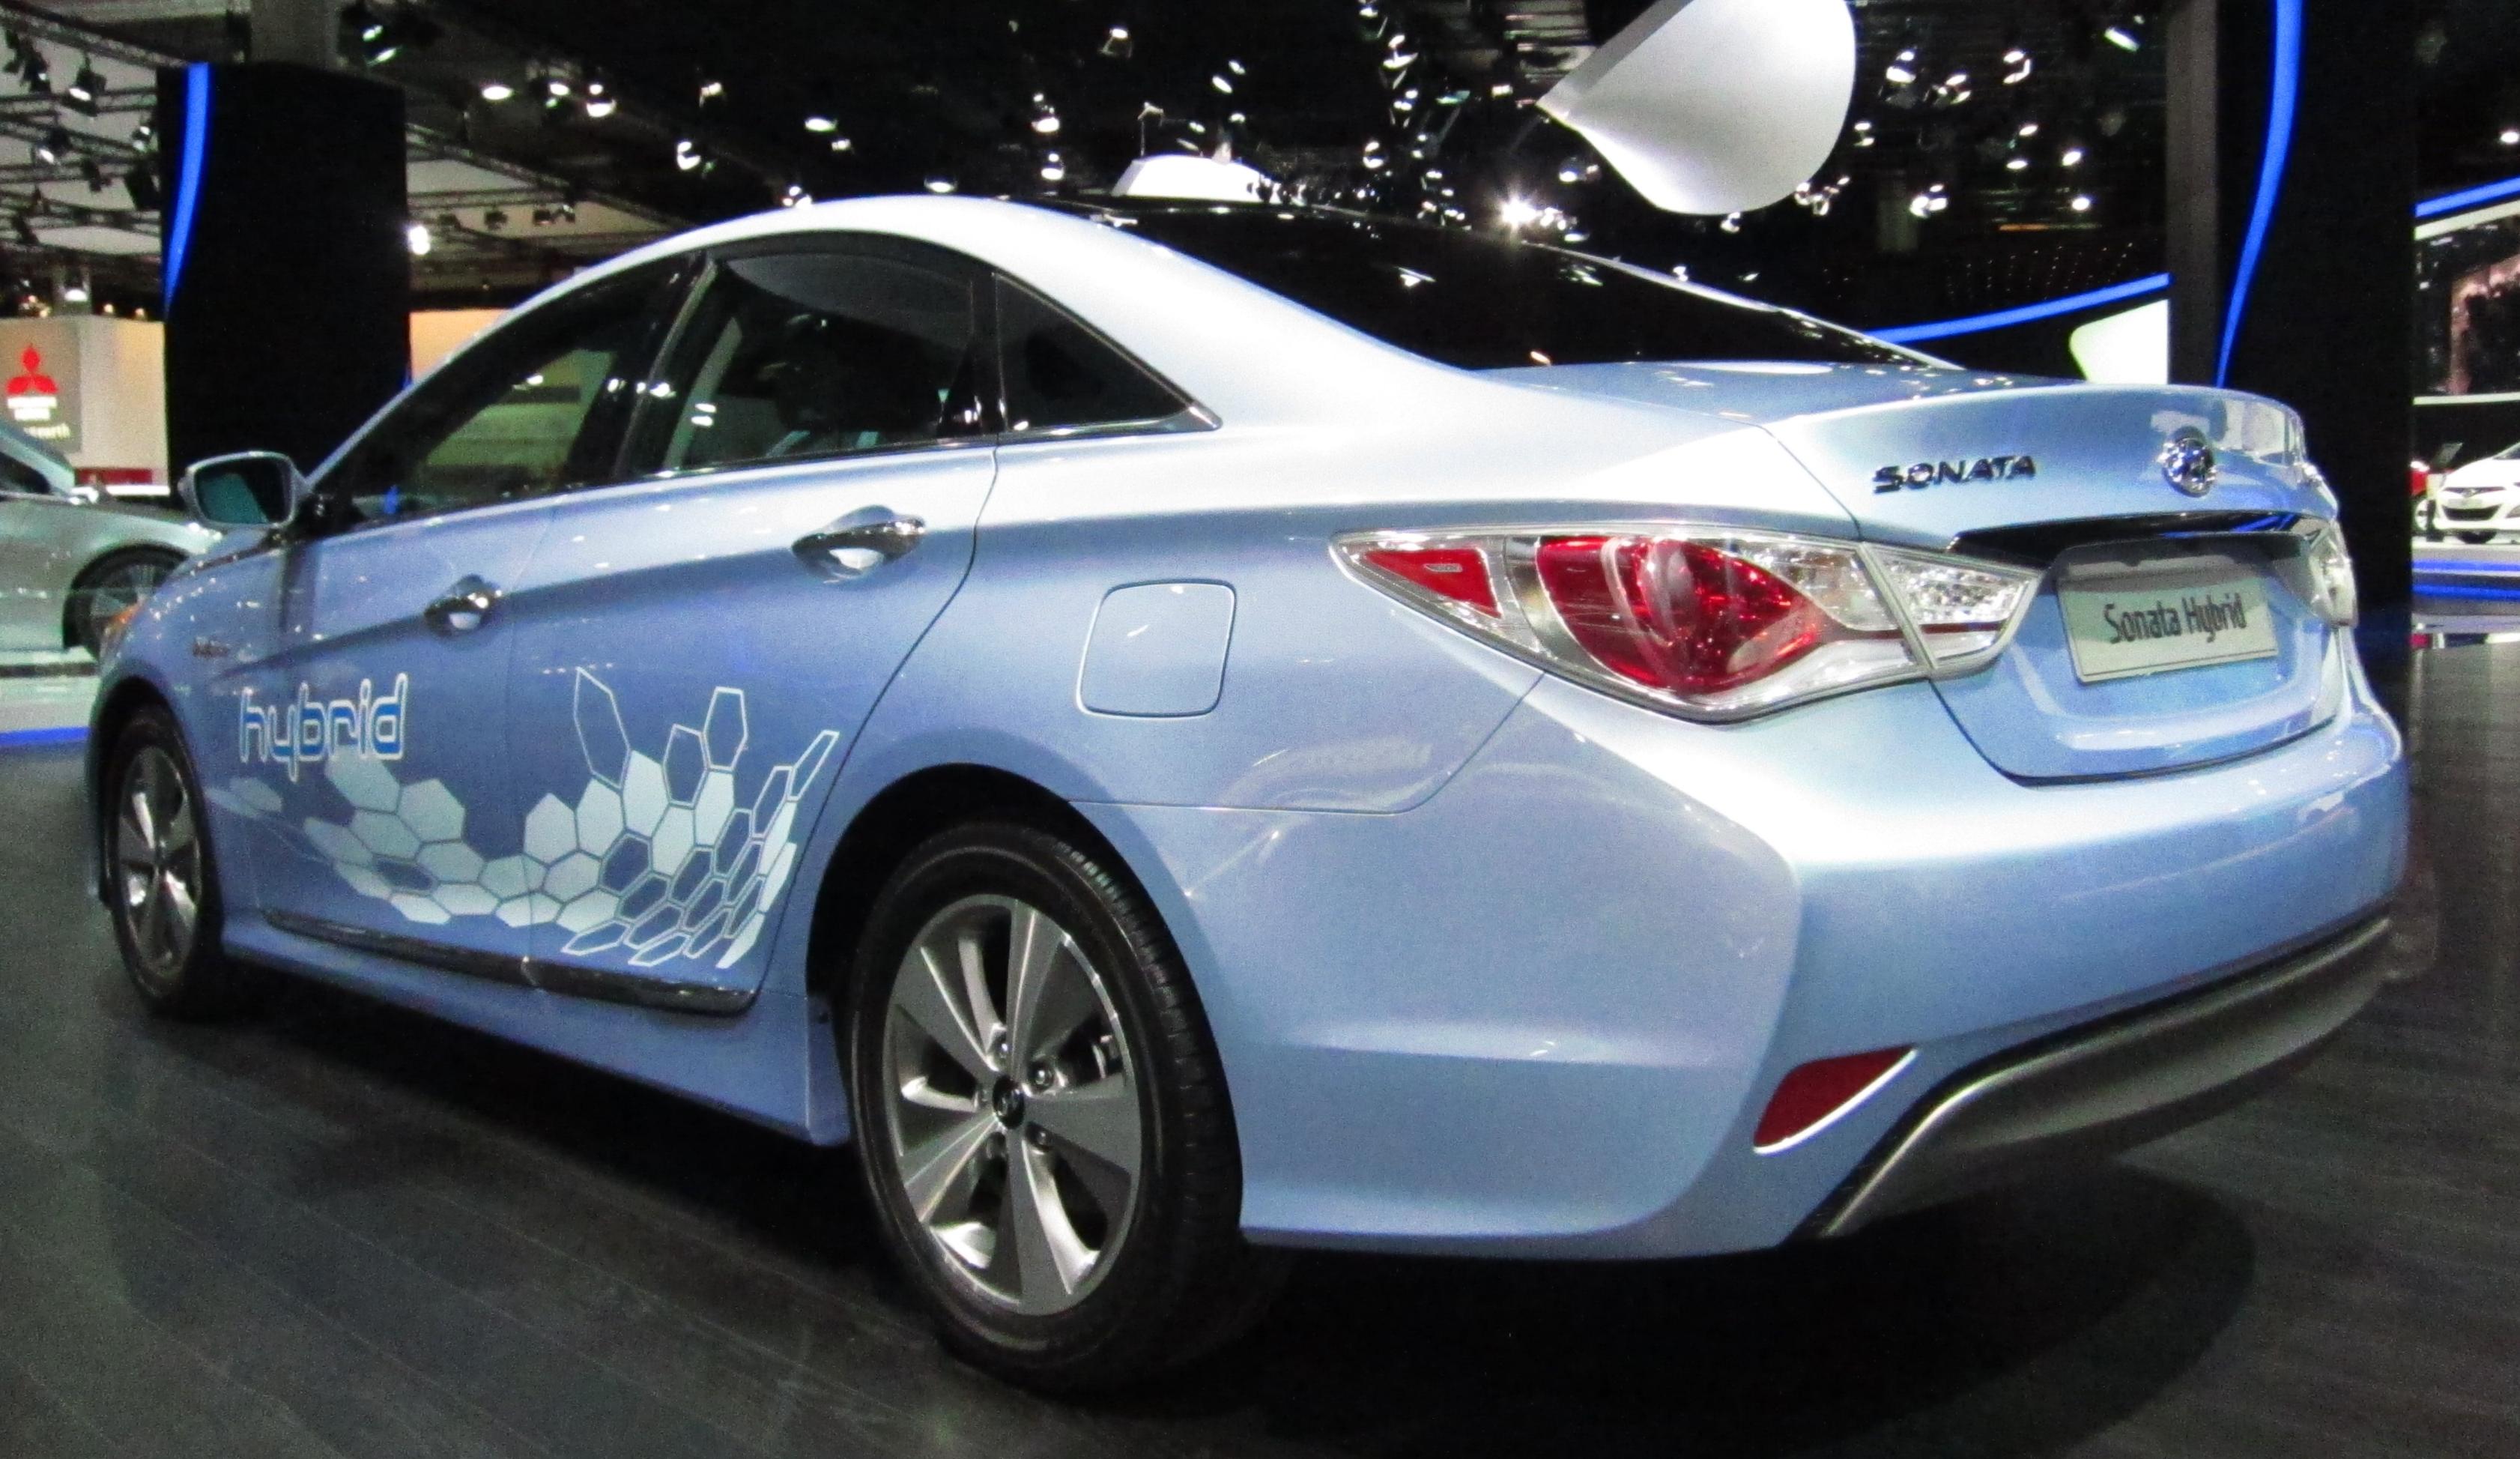 2017 Sonata Now On S Web Site Page 2 Hyundai Forums Forum